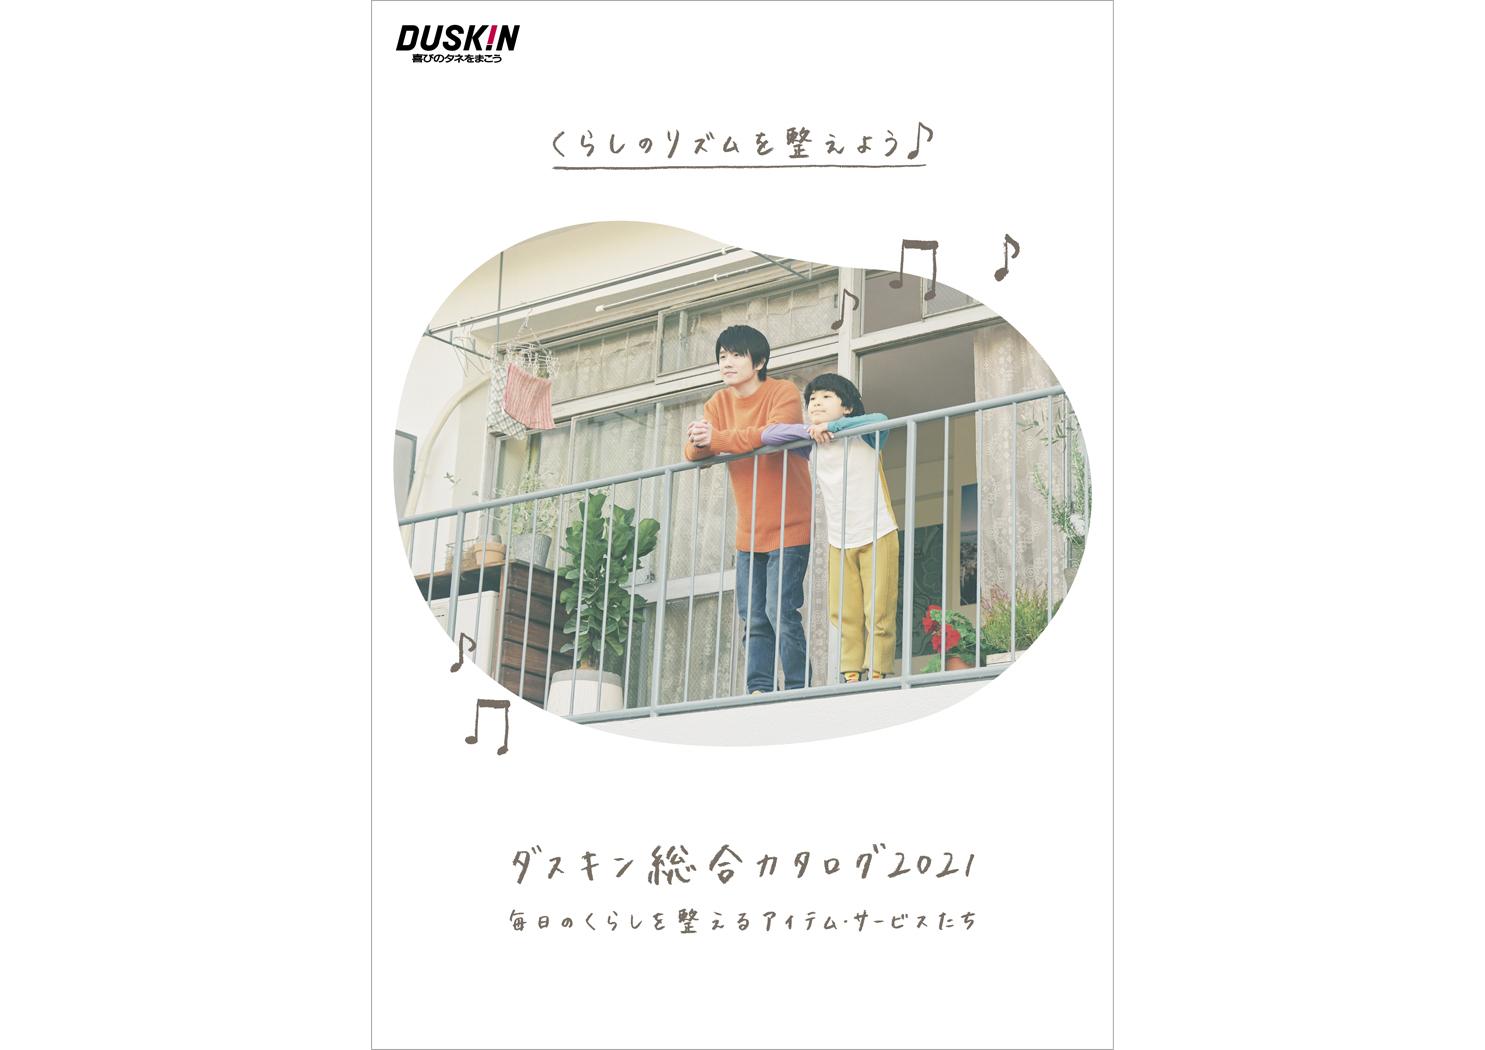 DUSKIN catalog